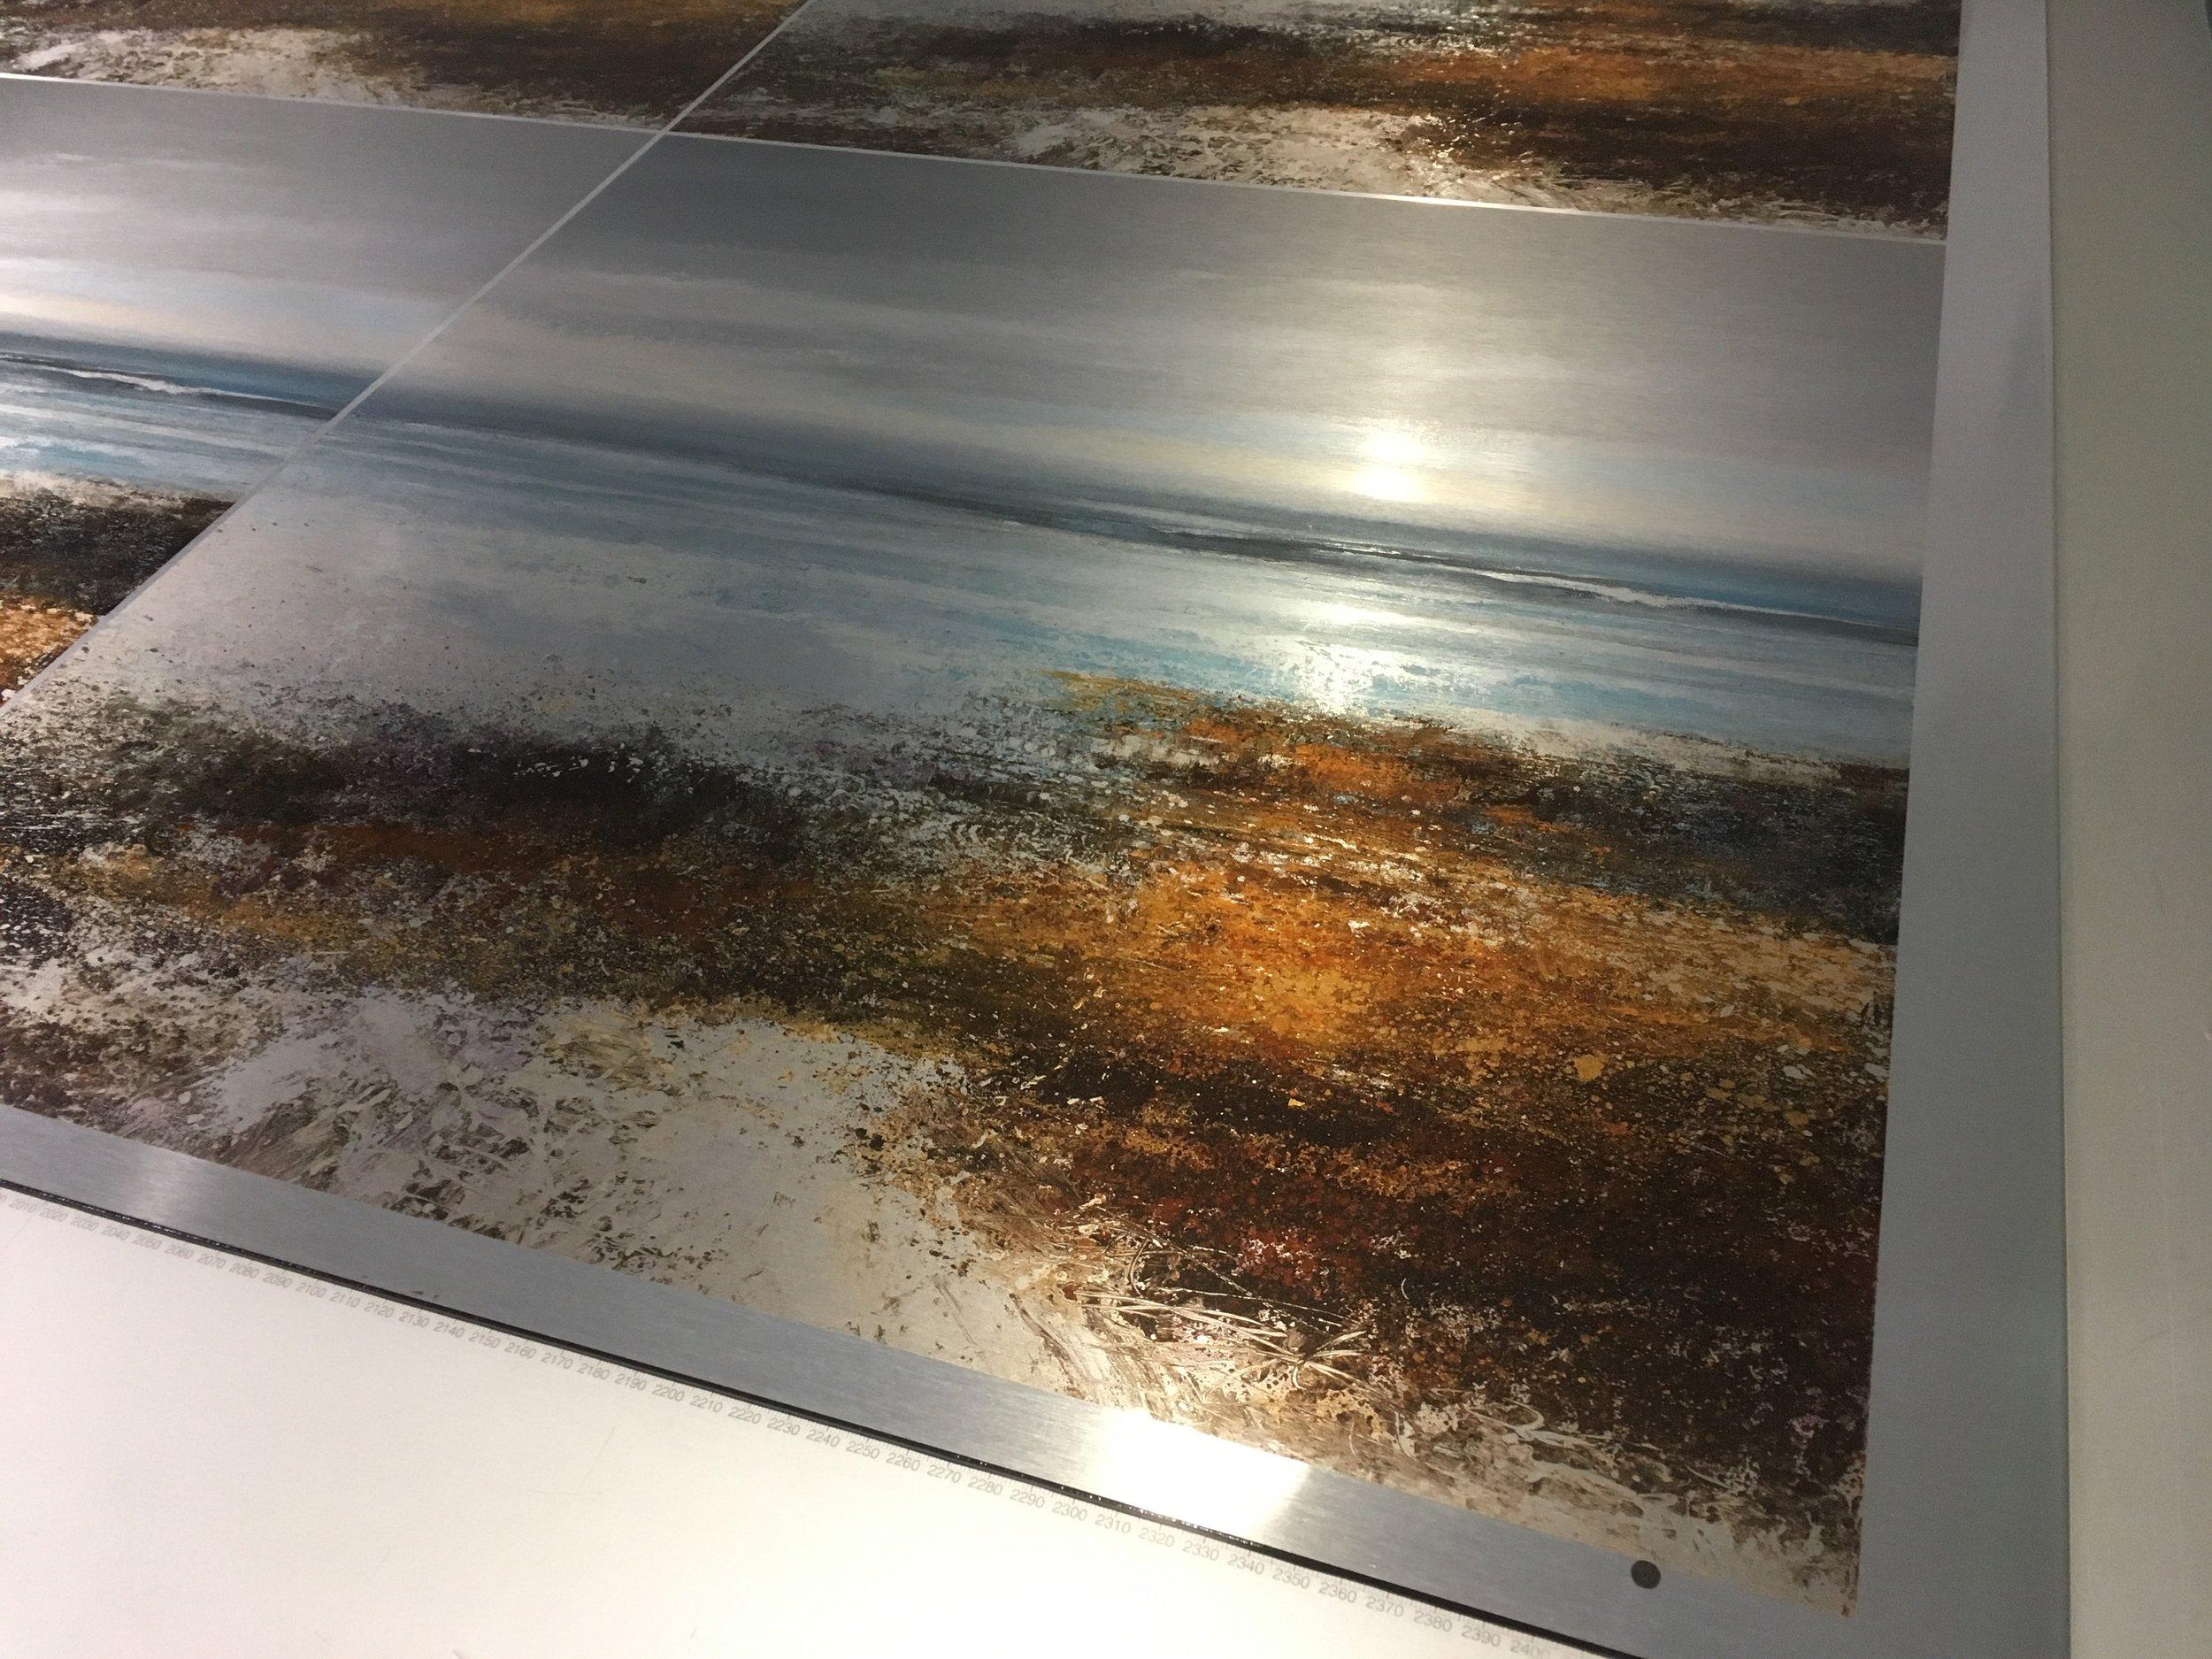 Fine Art Print on Brushed Alumimum